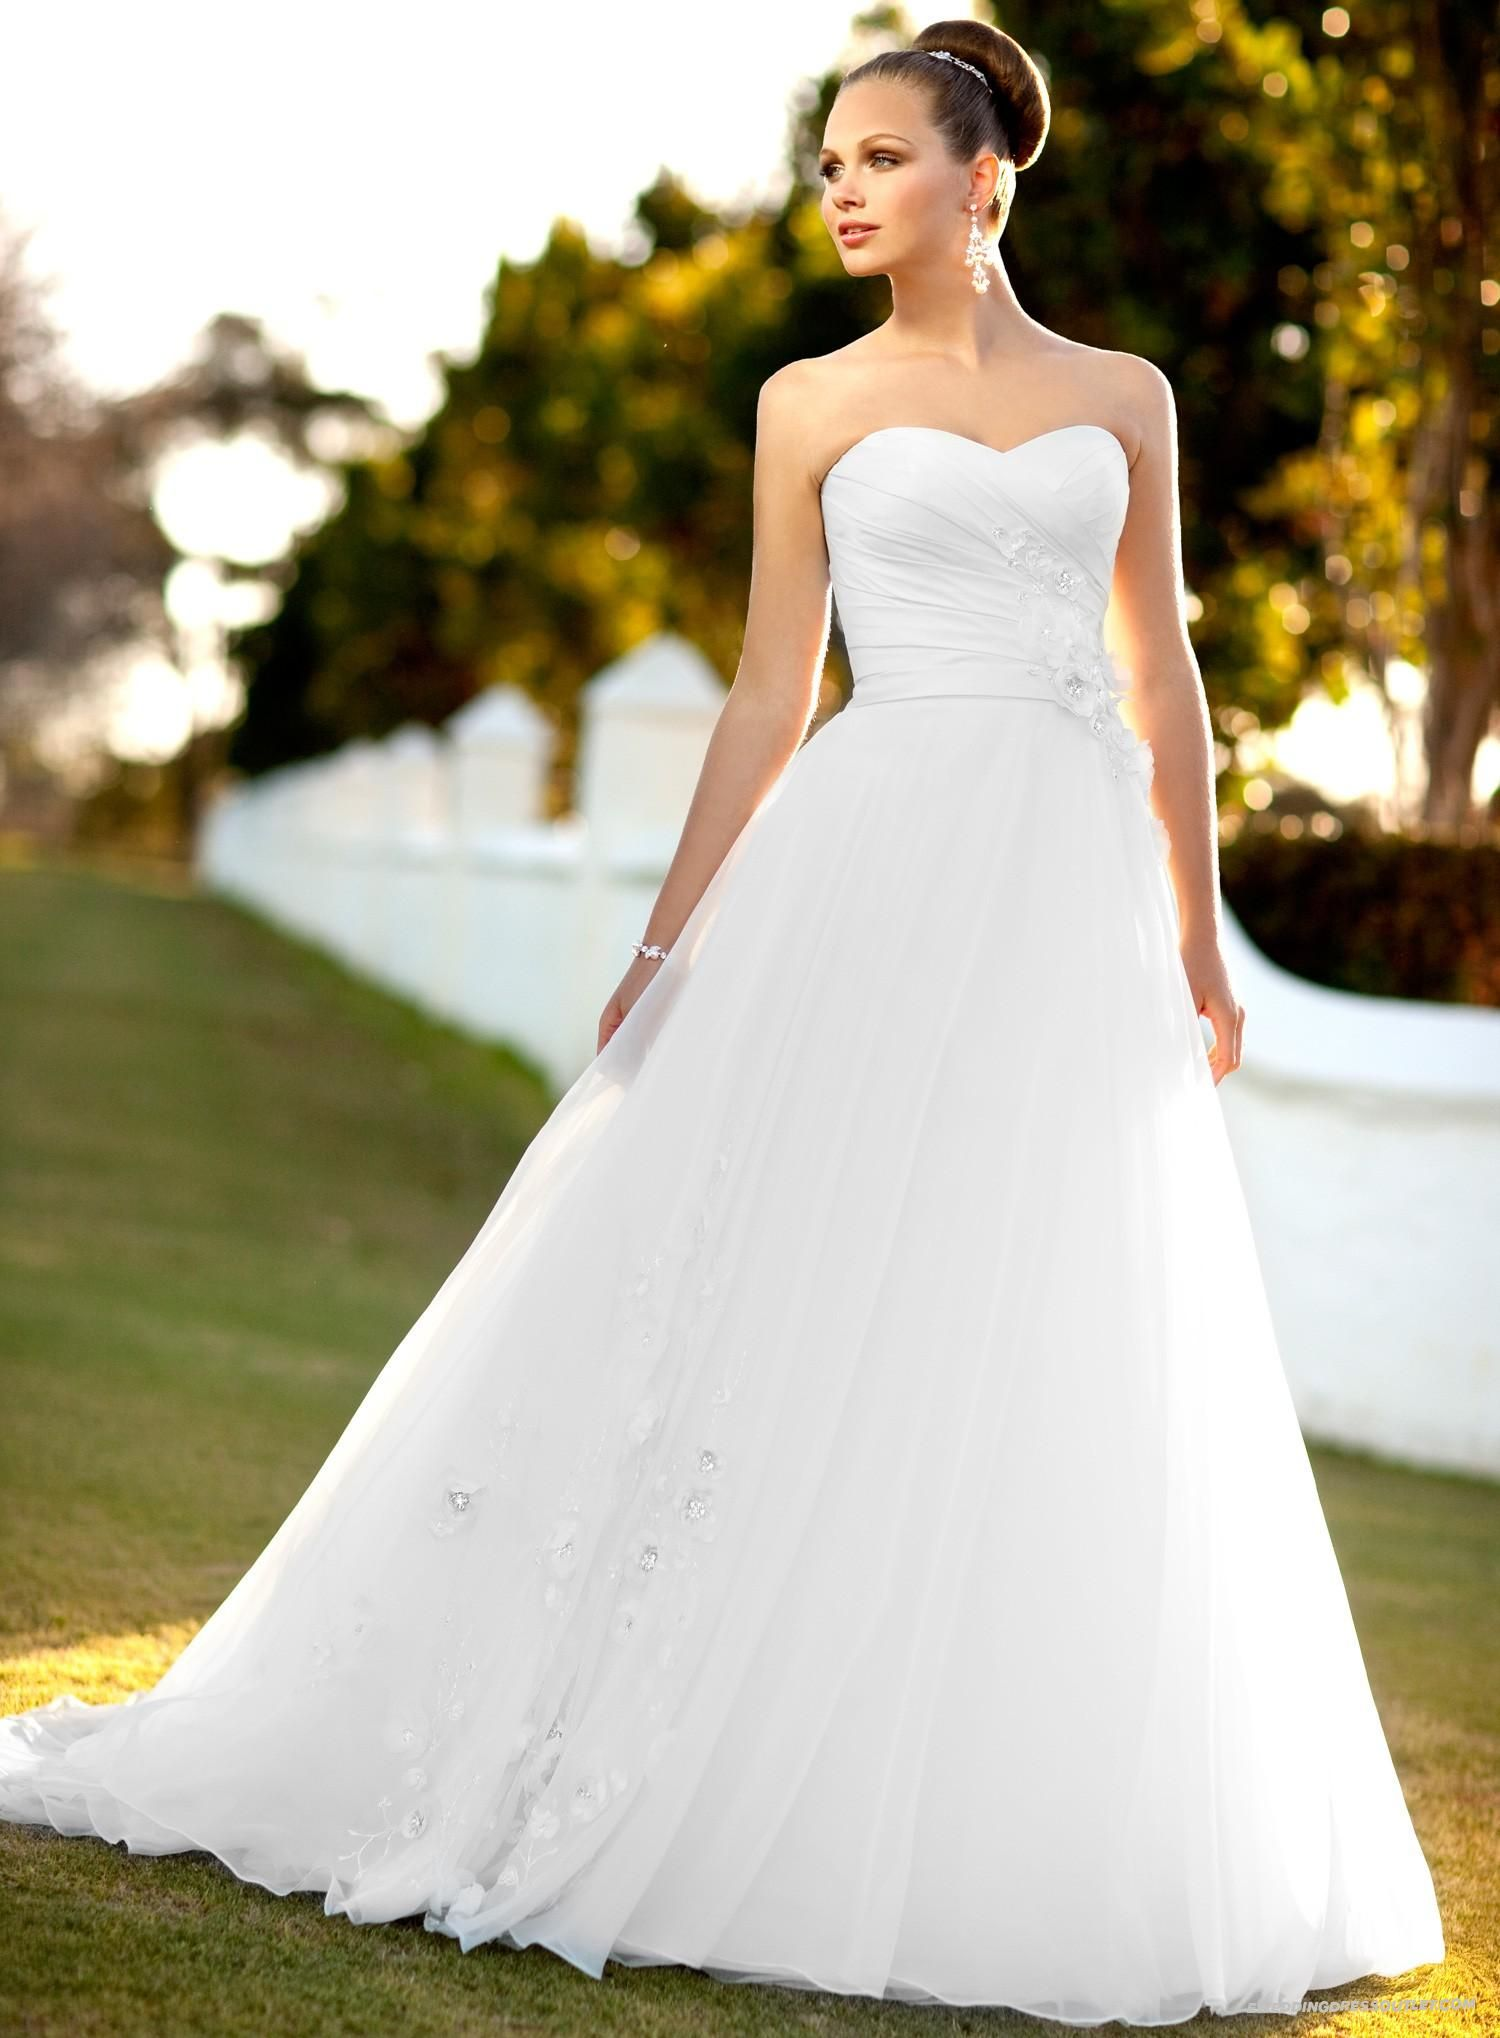 Fishtail wedding dress bespoke (Vera wang style) hoop